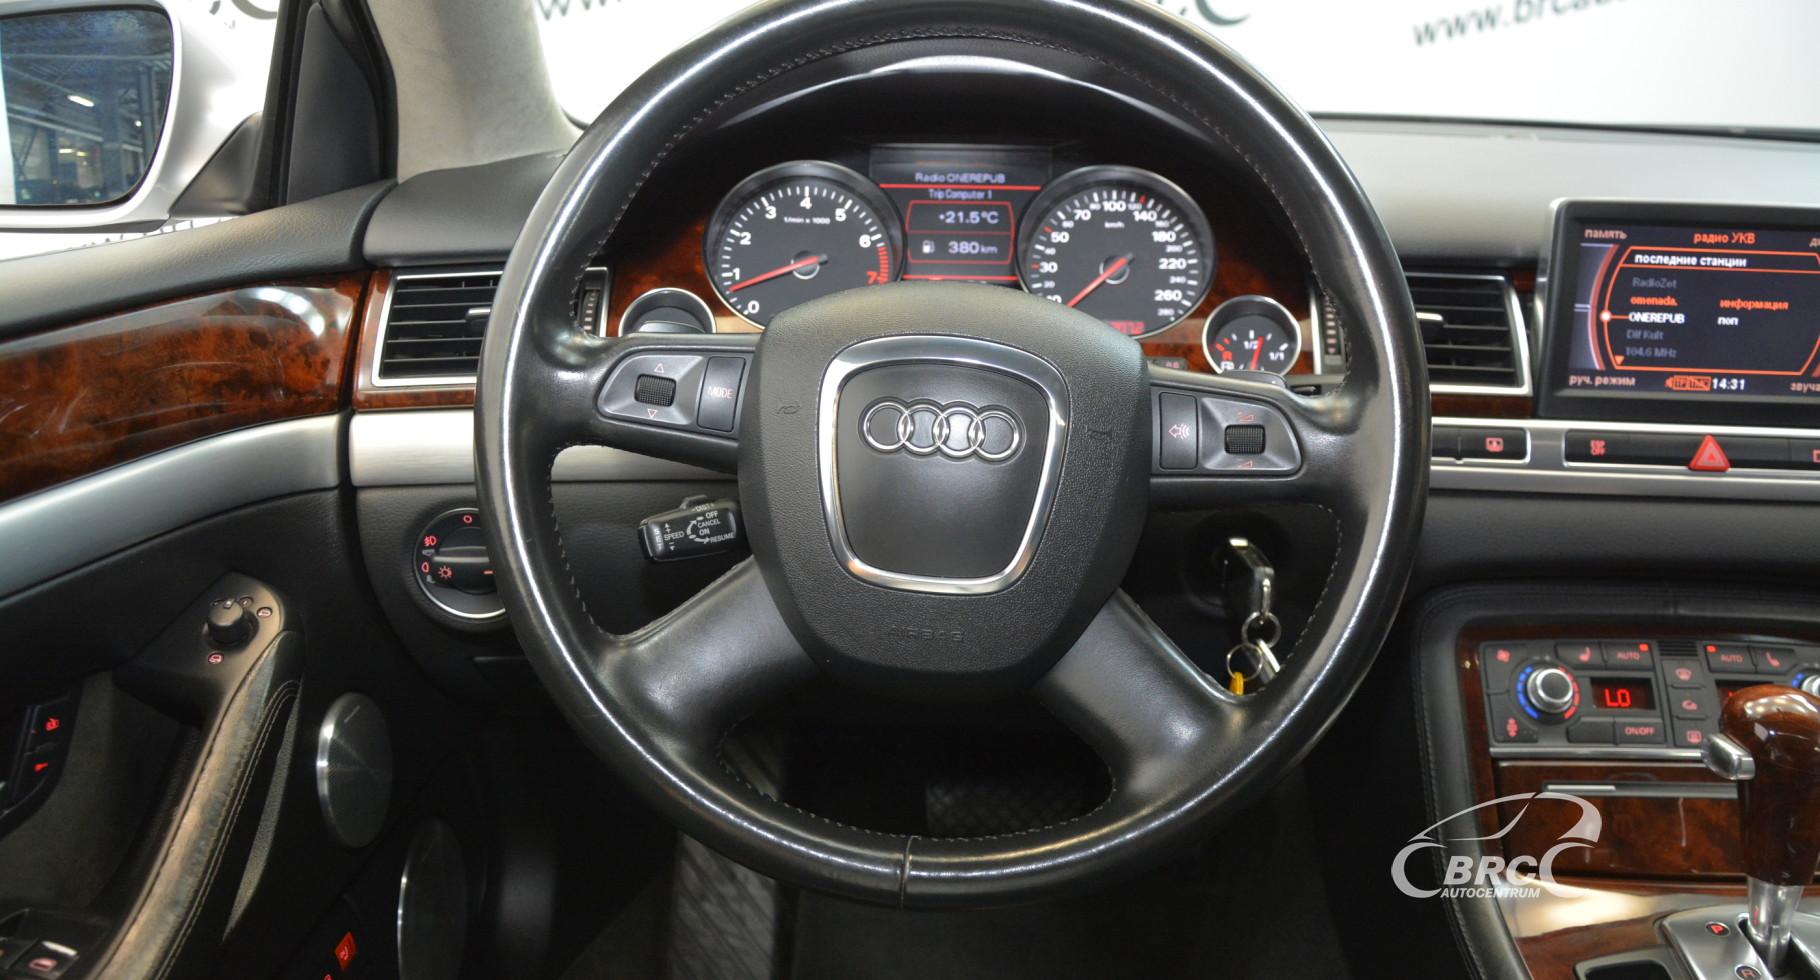 Audi A8 6.0 W12 Quattro Long Automatas